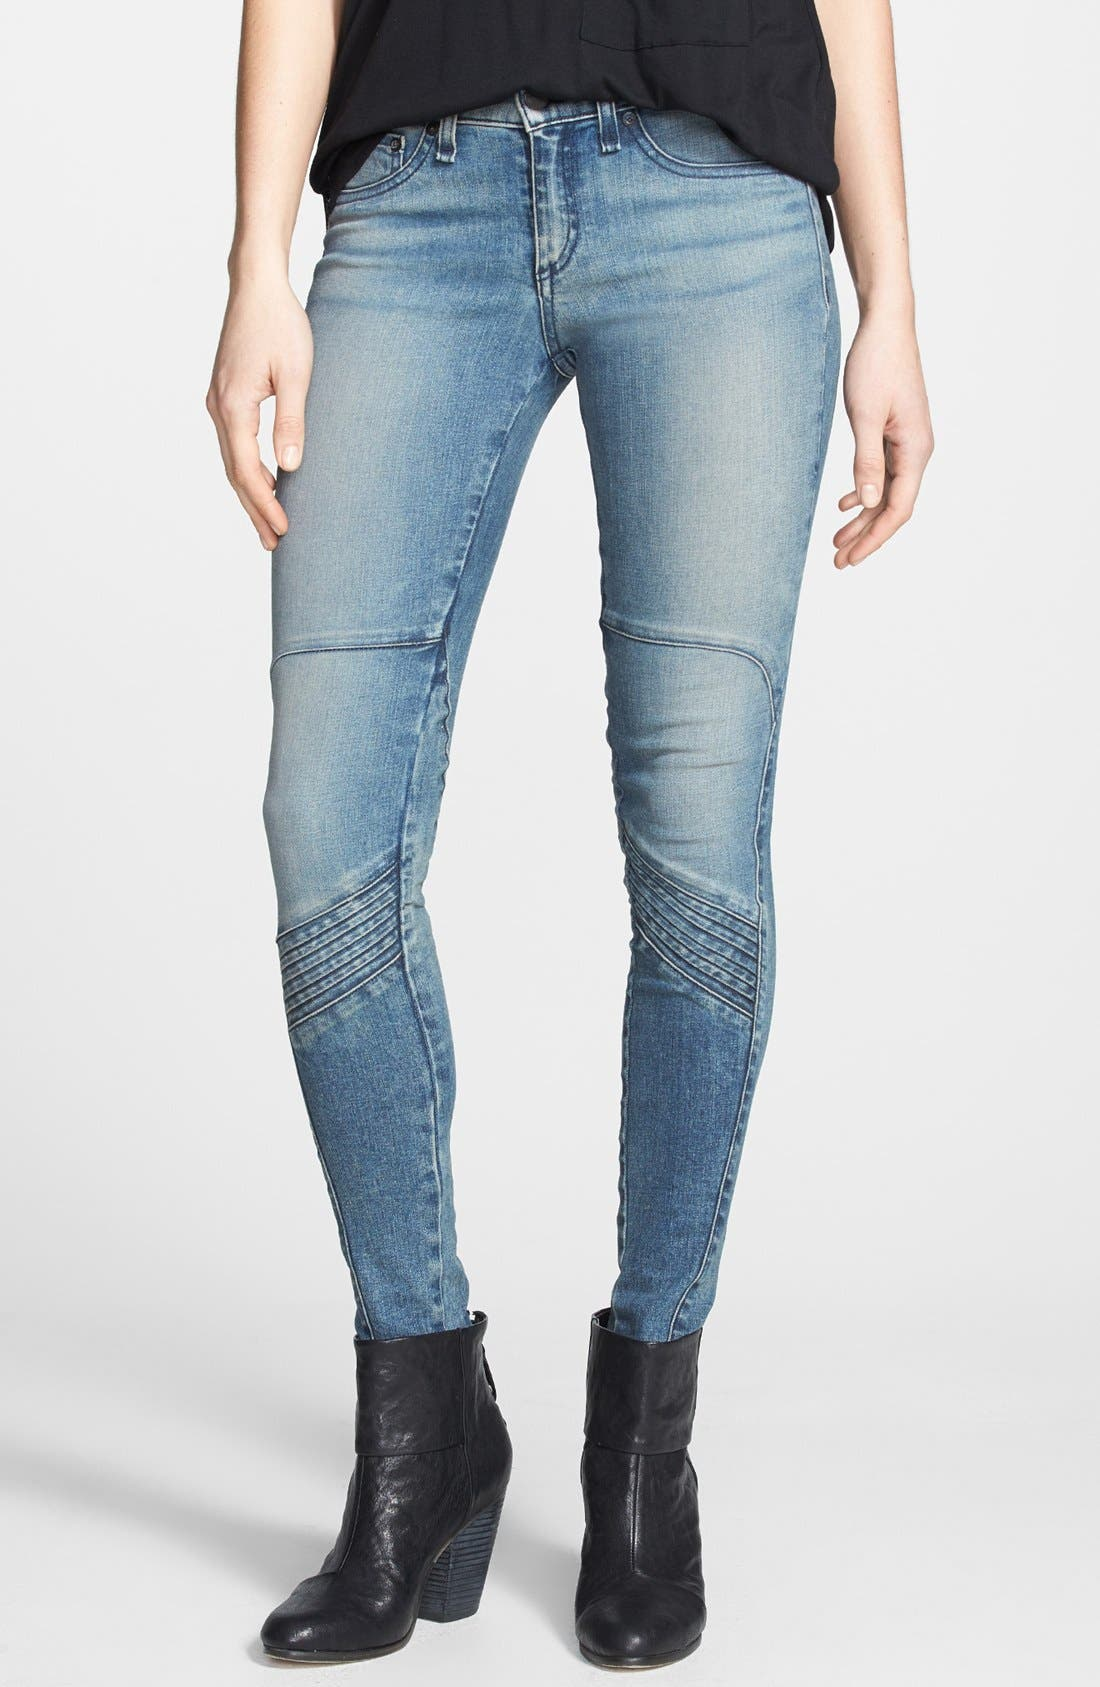 Main Image - rag & bone/JEAN 'Samurai Legging' Skinny Jeans (Cardiff)